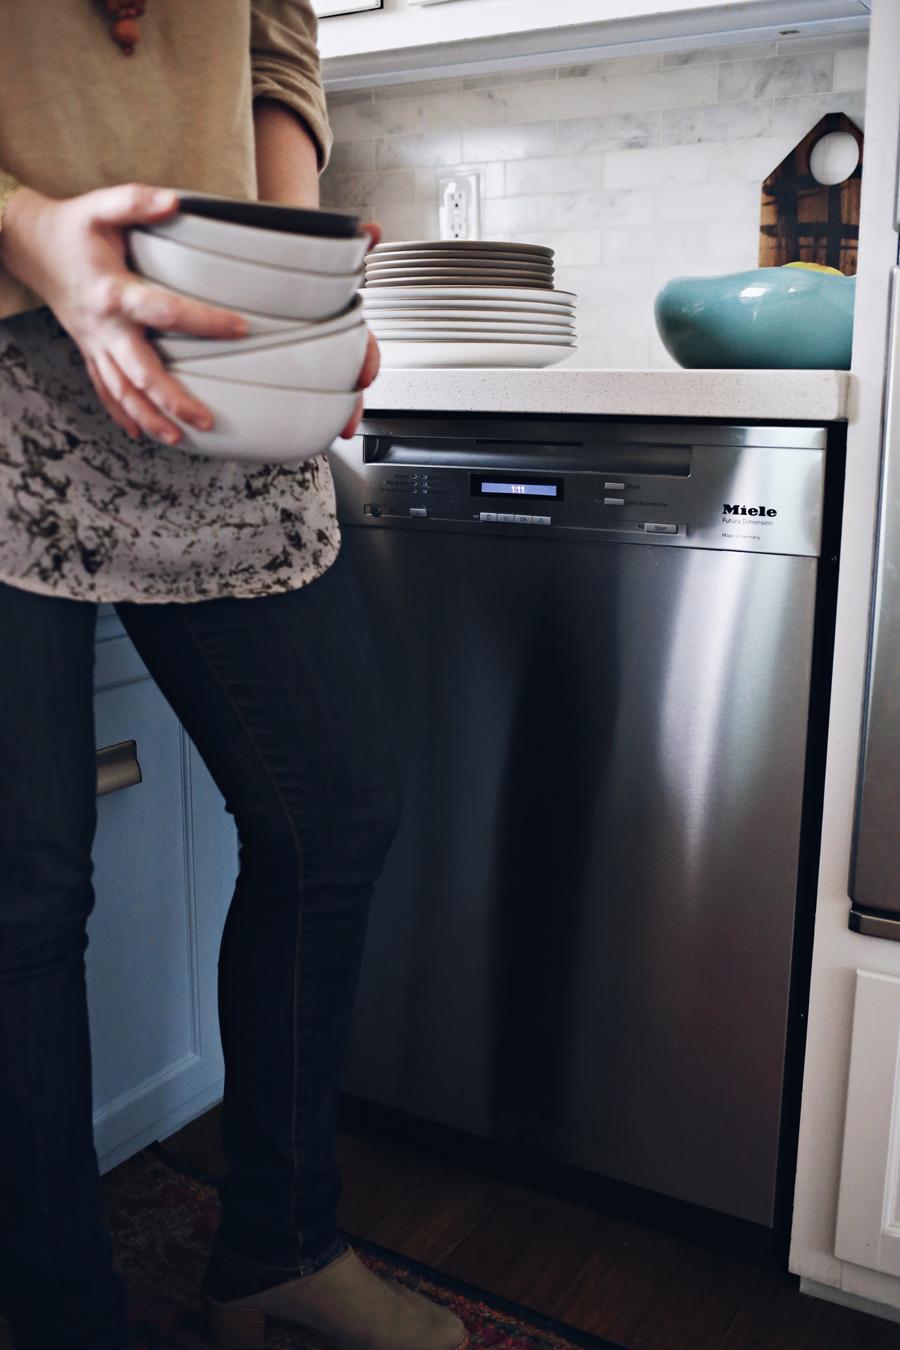 miele-futura-dishwasher-review-dine-x-design